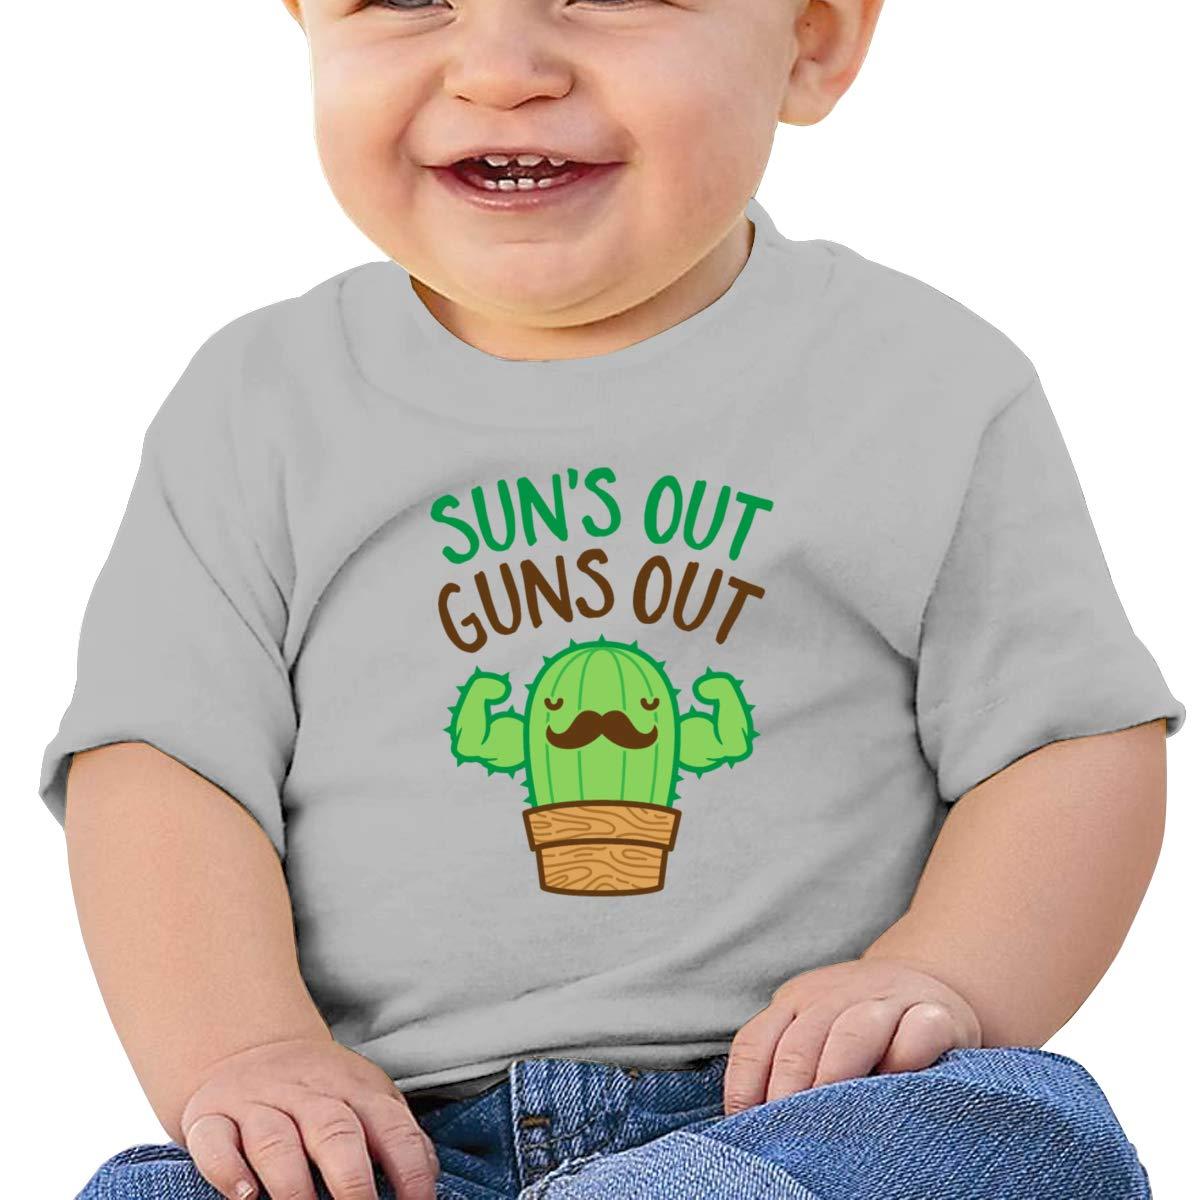 Suns Out Guns Out Infan Short Sleeve Shirt Girls Birthday Gift